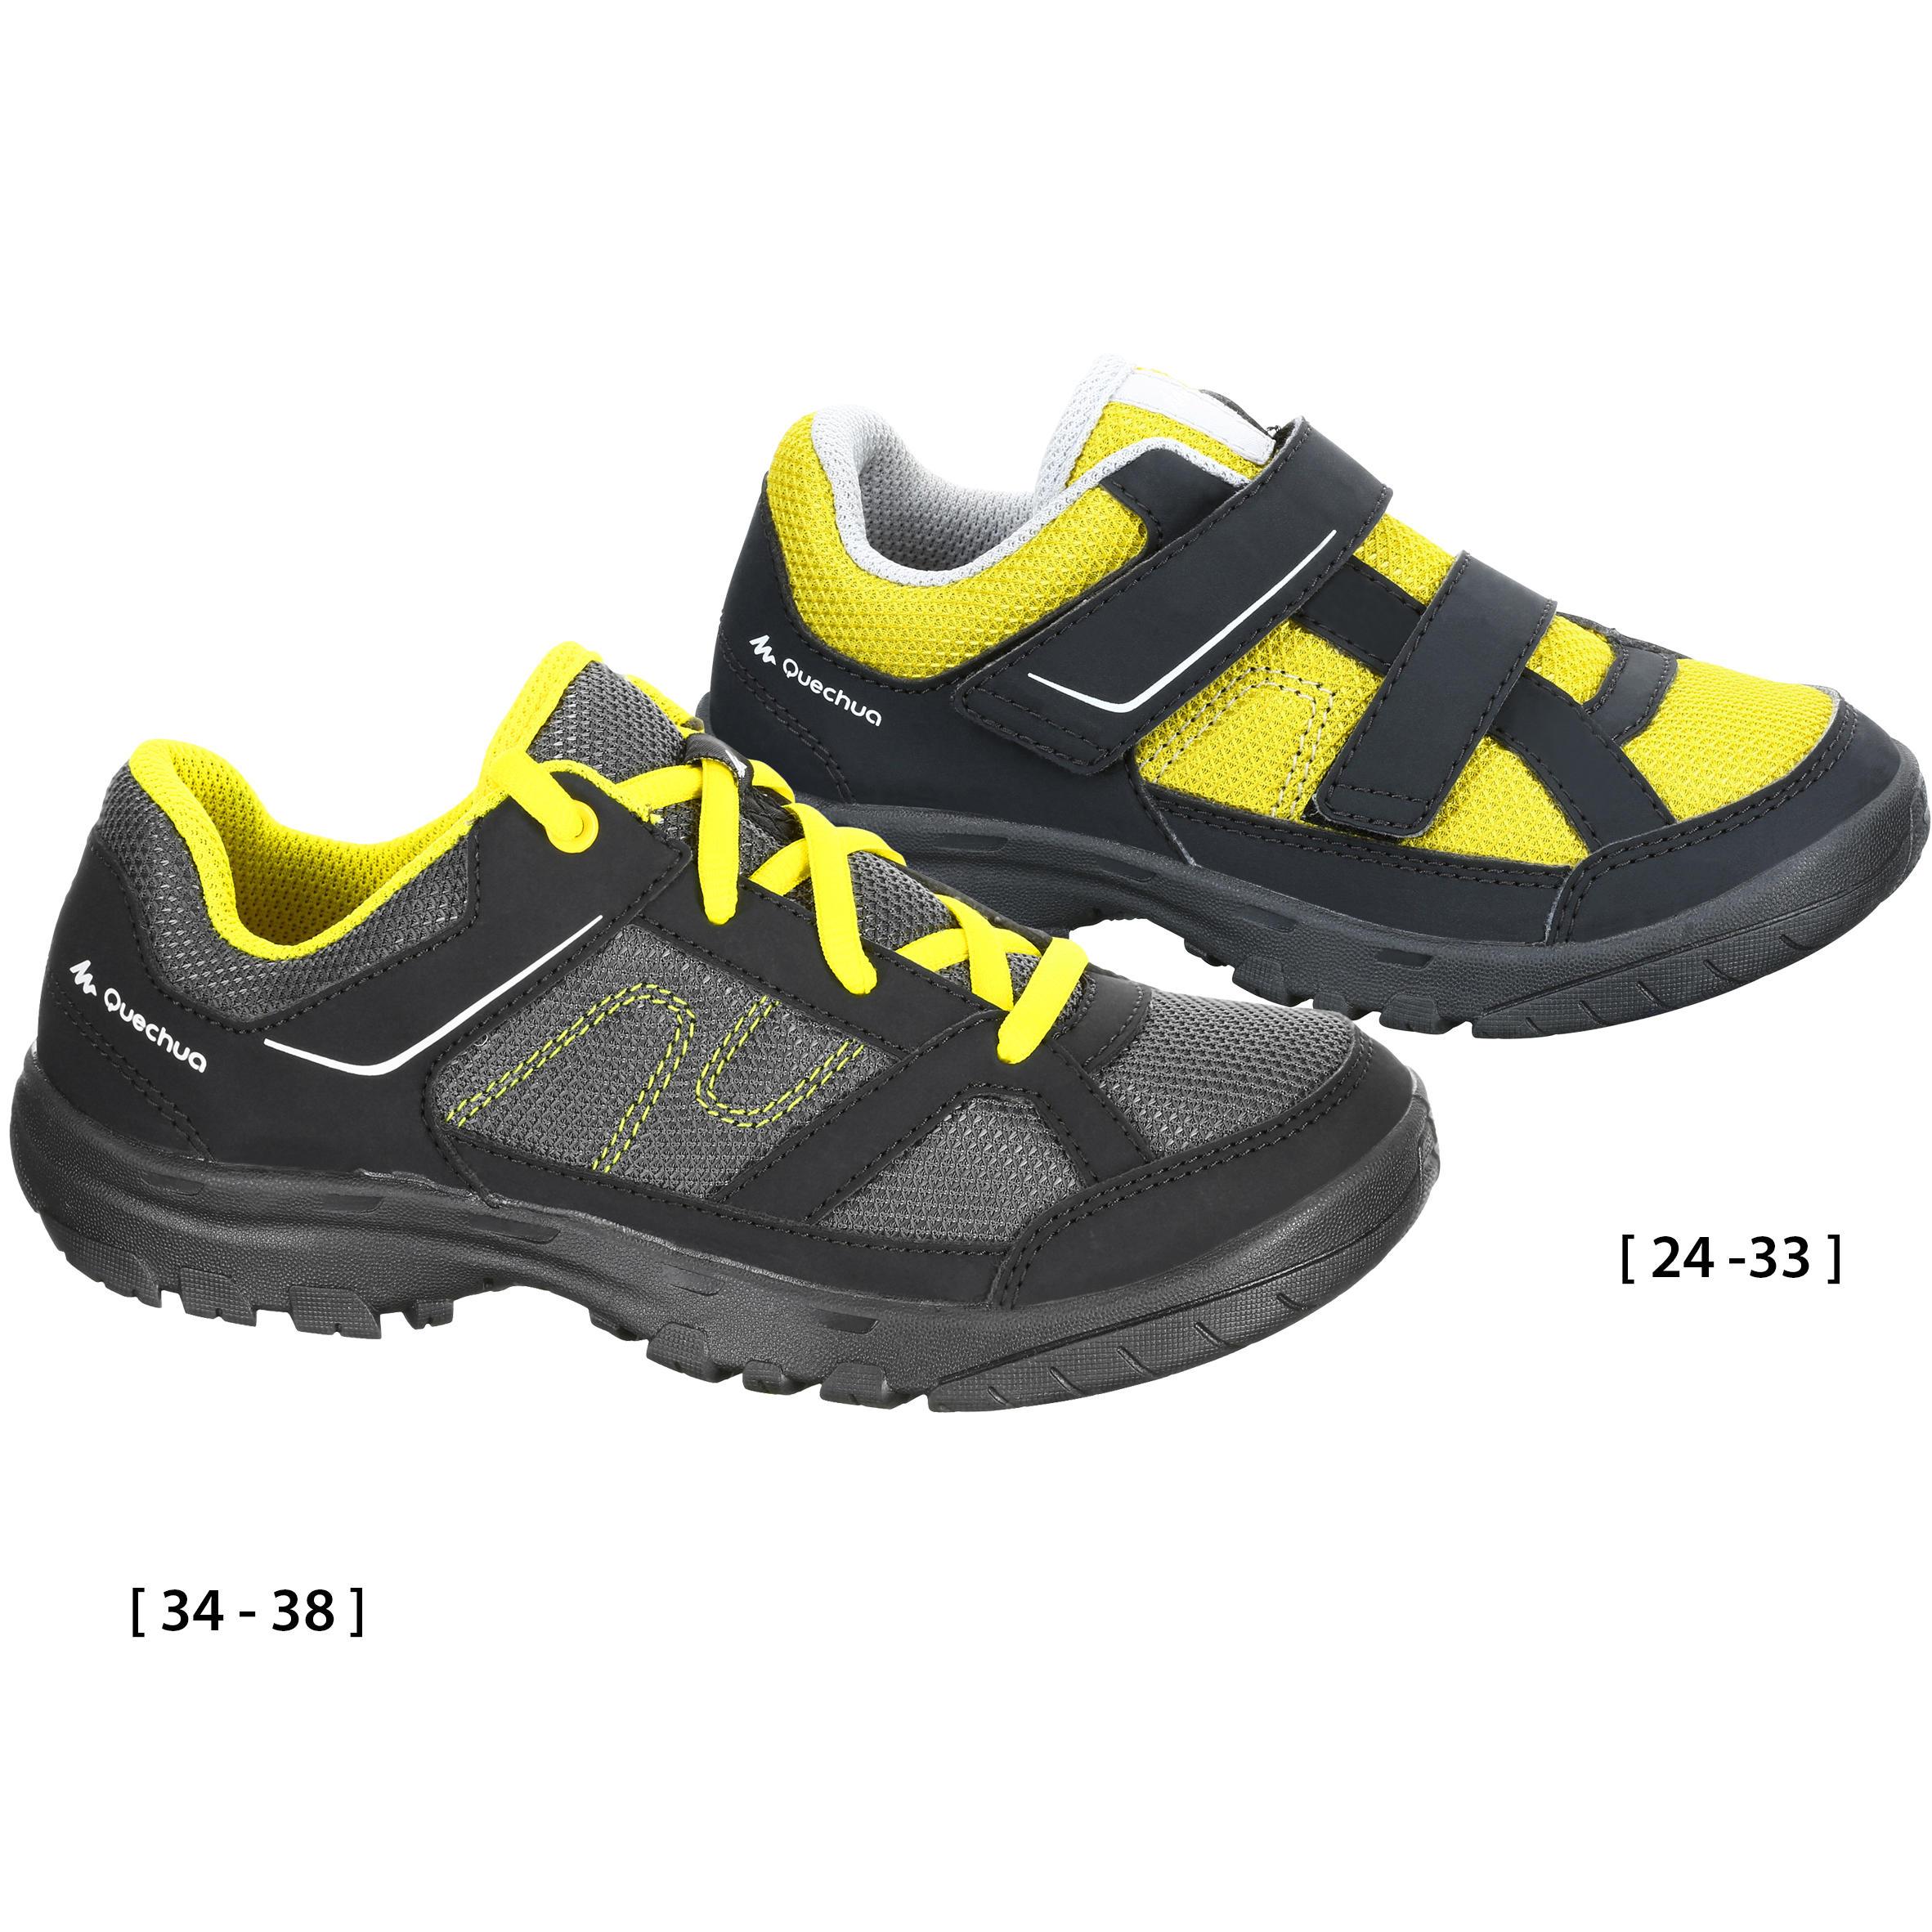 Arpenaz 50 Children's Hiking Boots - Yellow